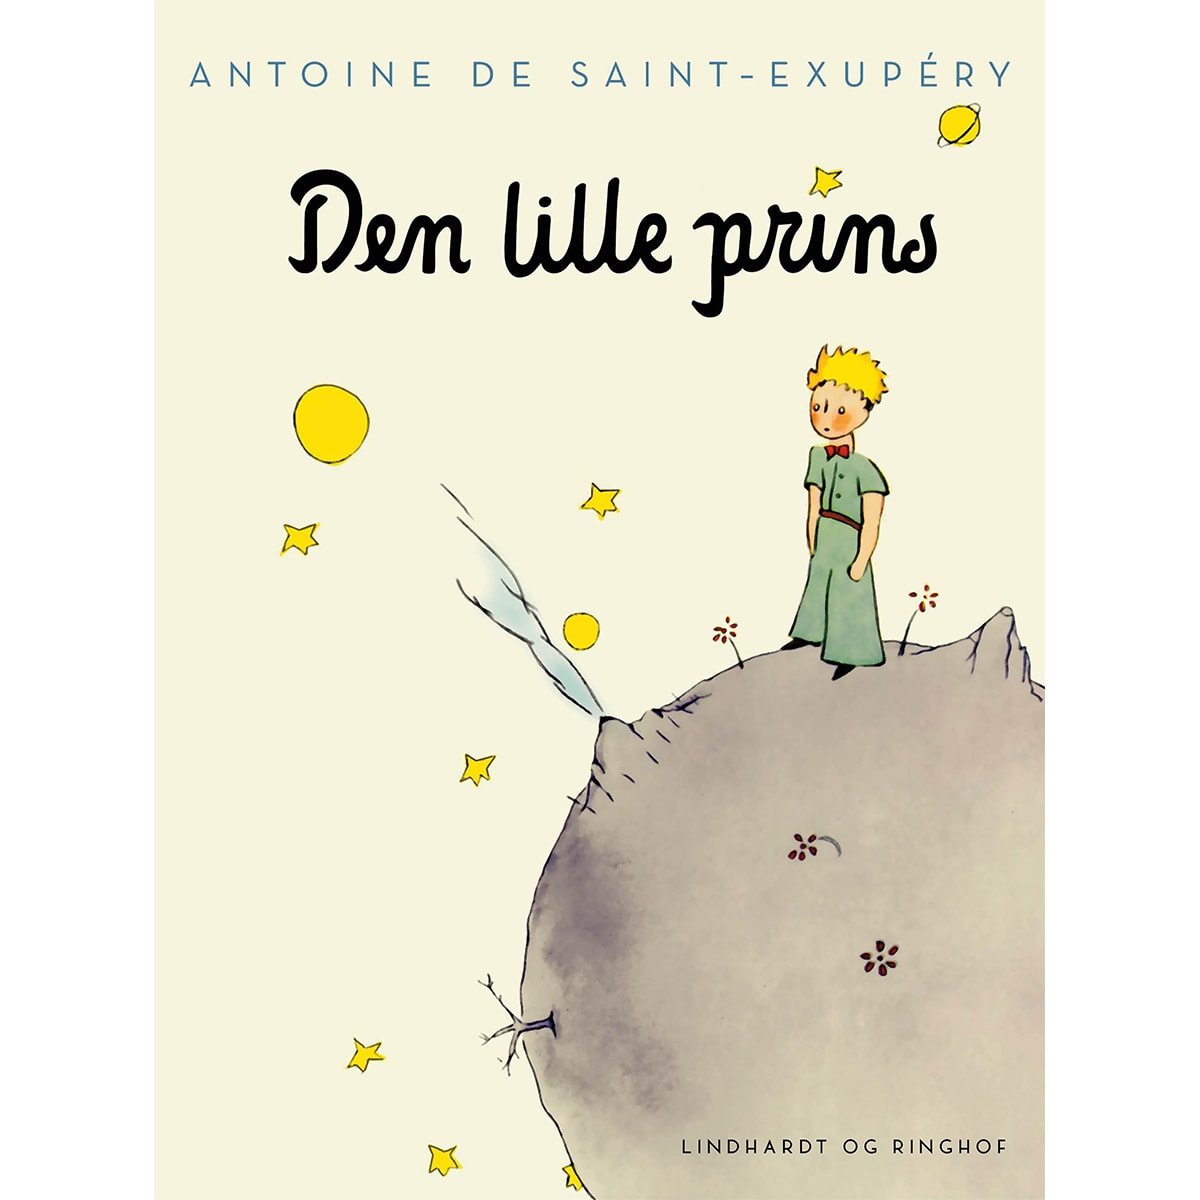 Af Antoine de Saint-Exupery